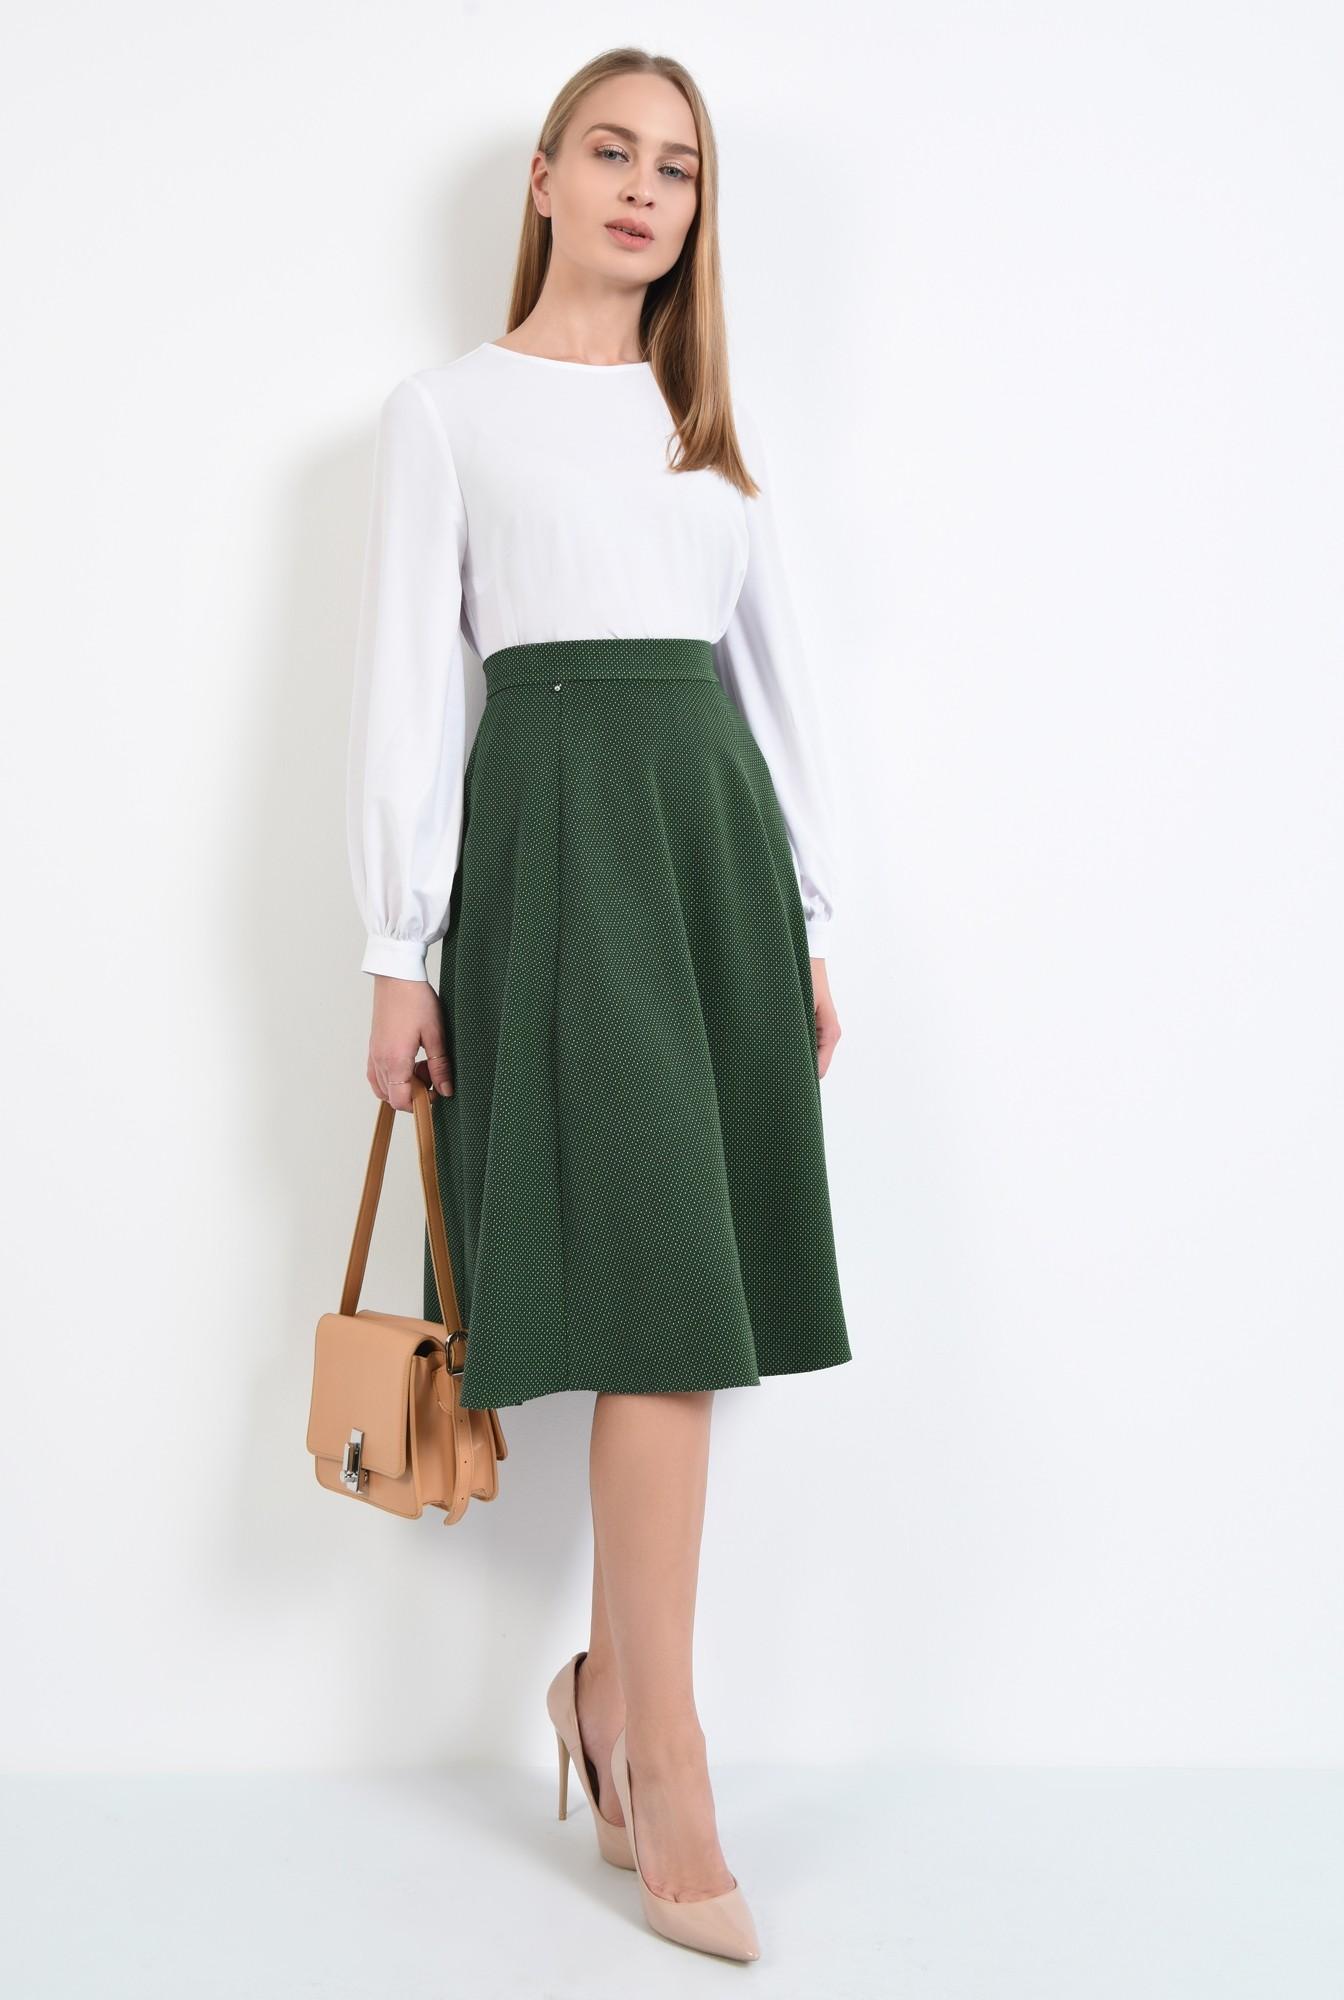 3 - fusta de zi, evazata, verde, cu picouri albe, cu talie inalta